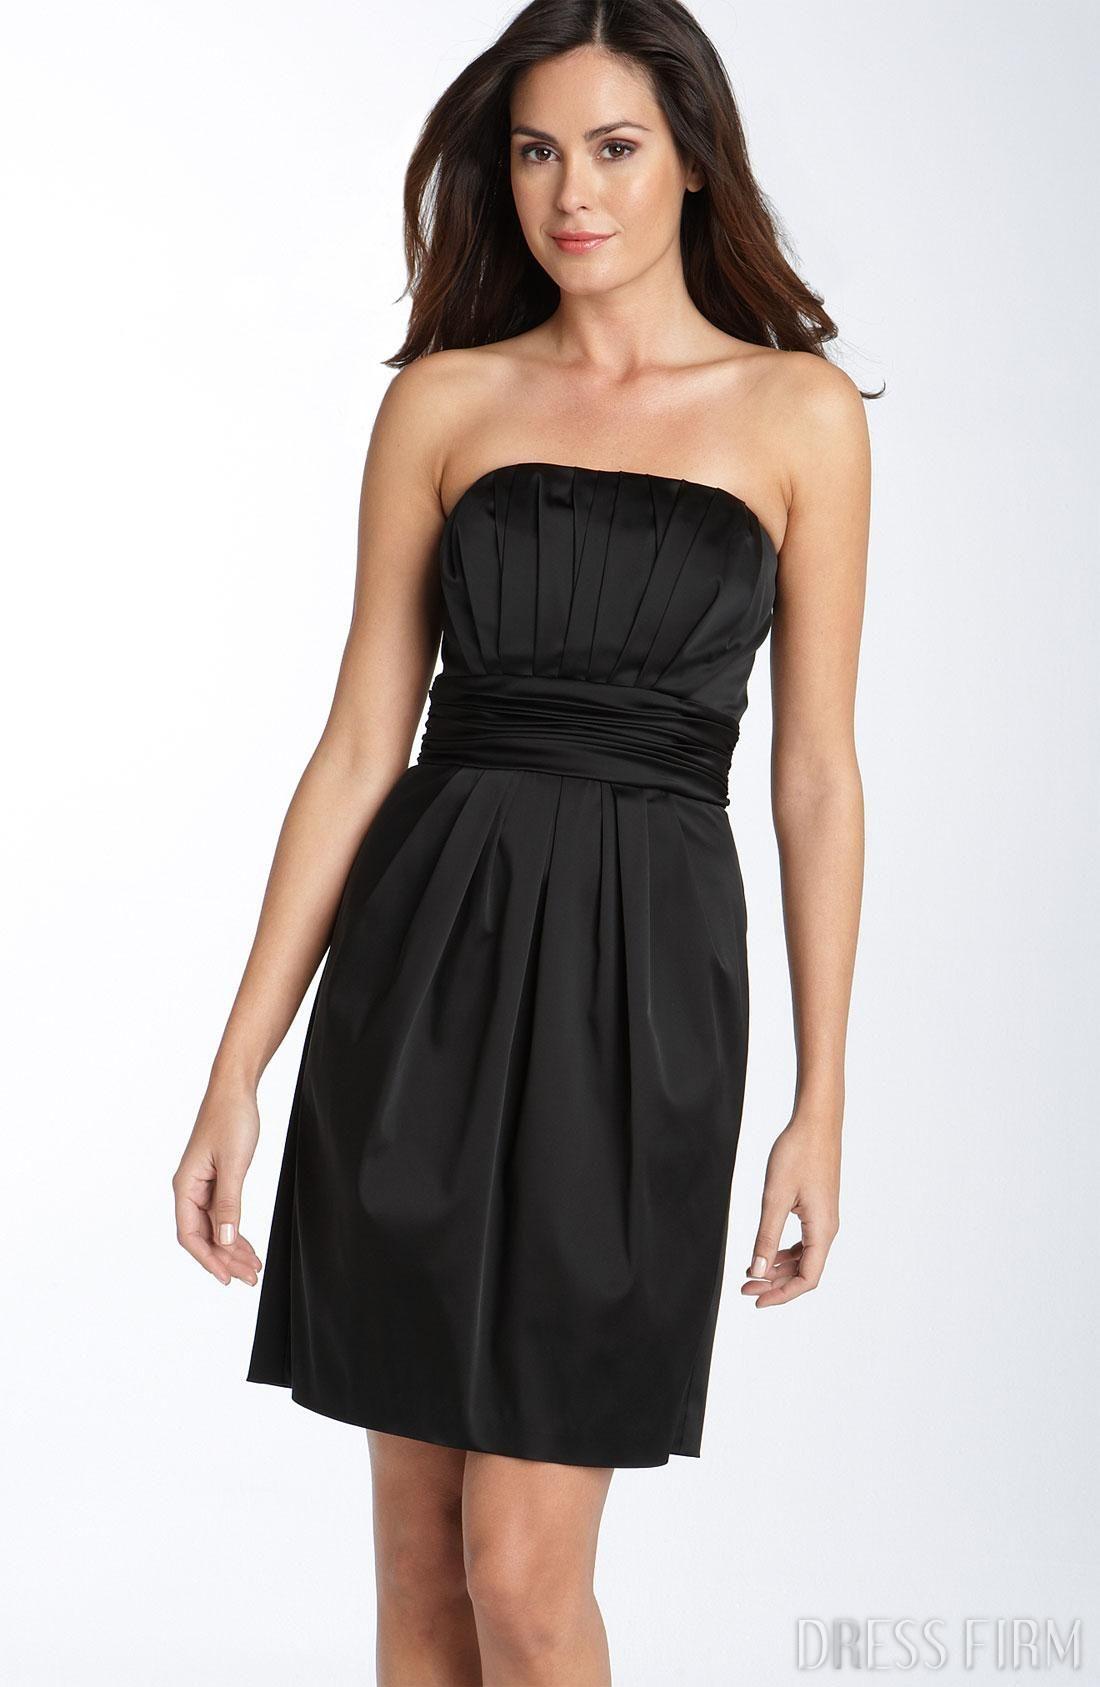 Fashionable draped empire waist strapless bridesmaid dress free